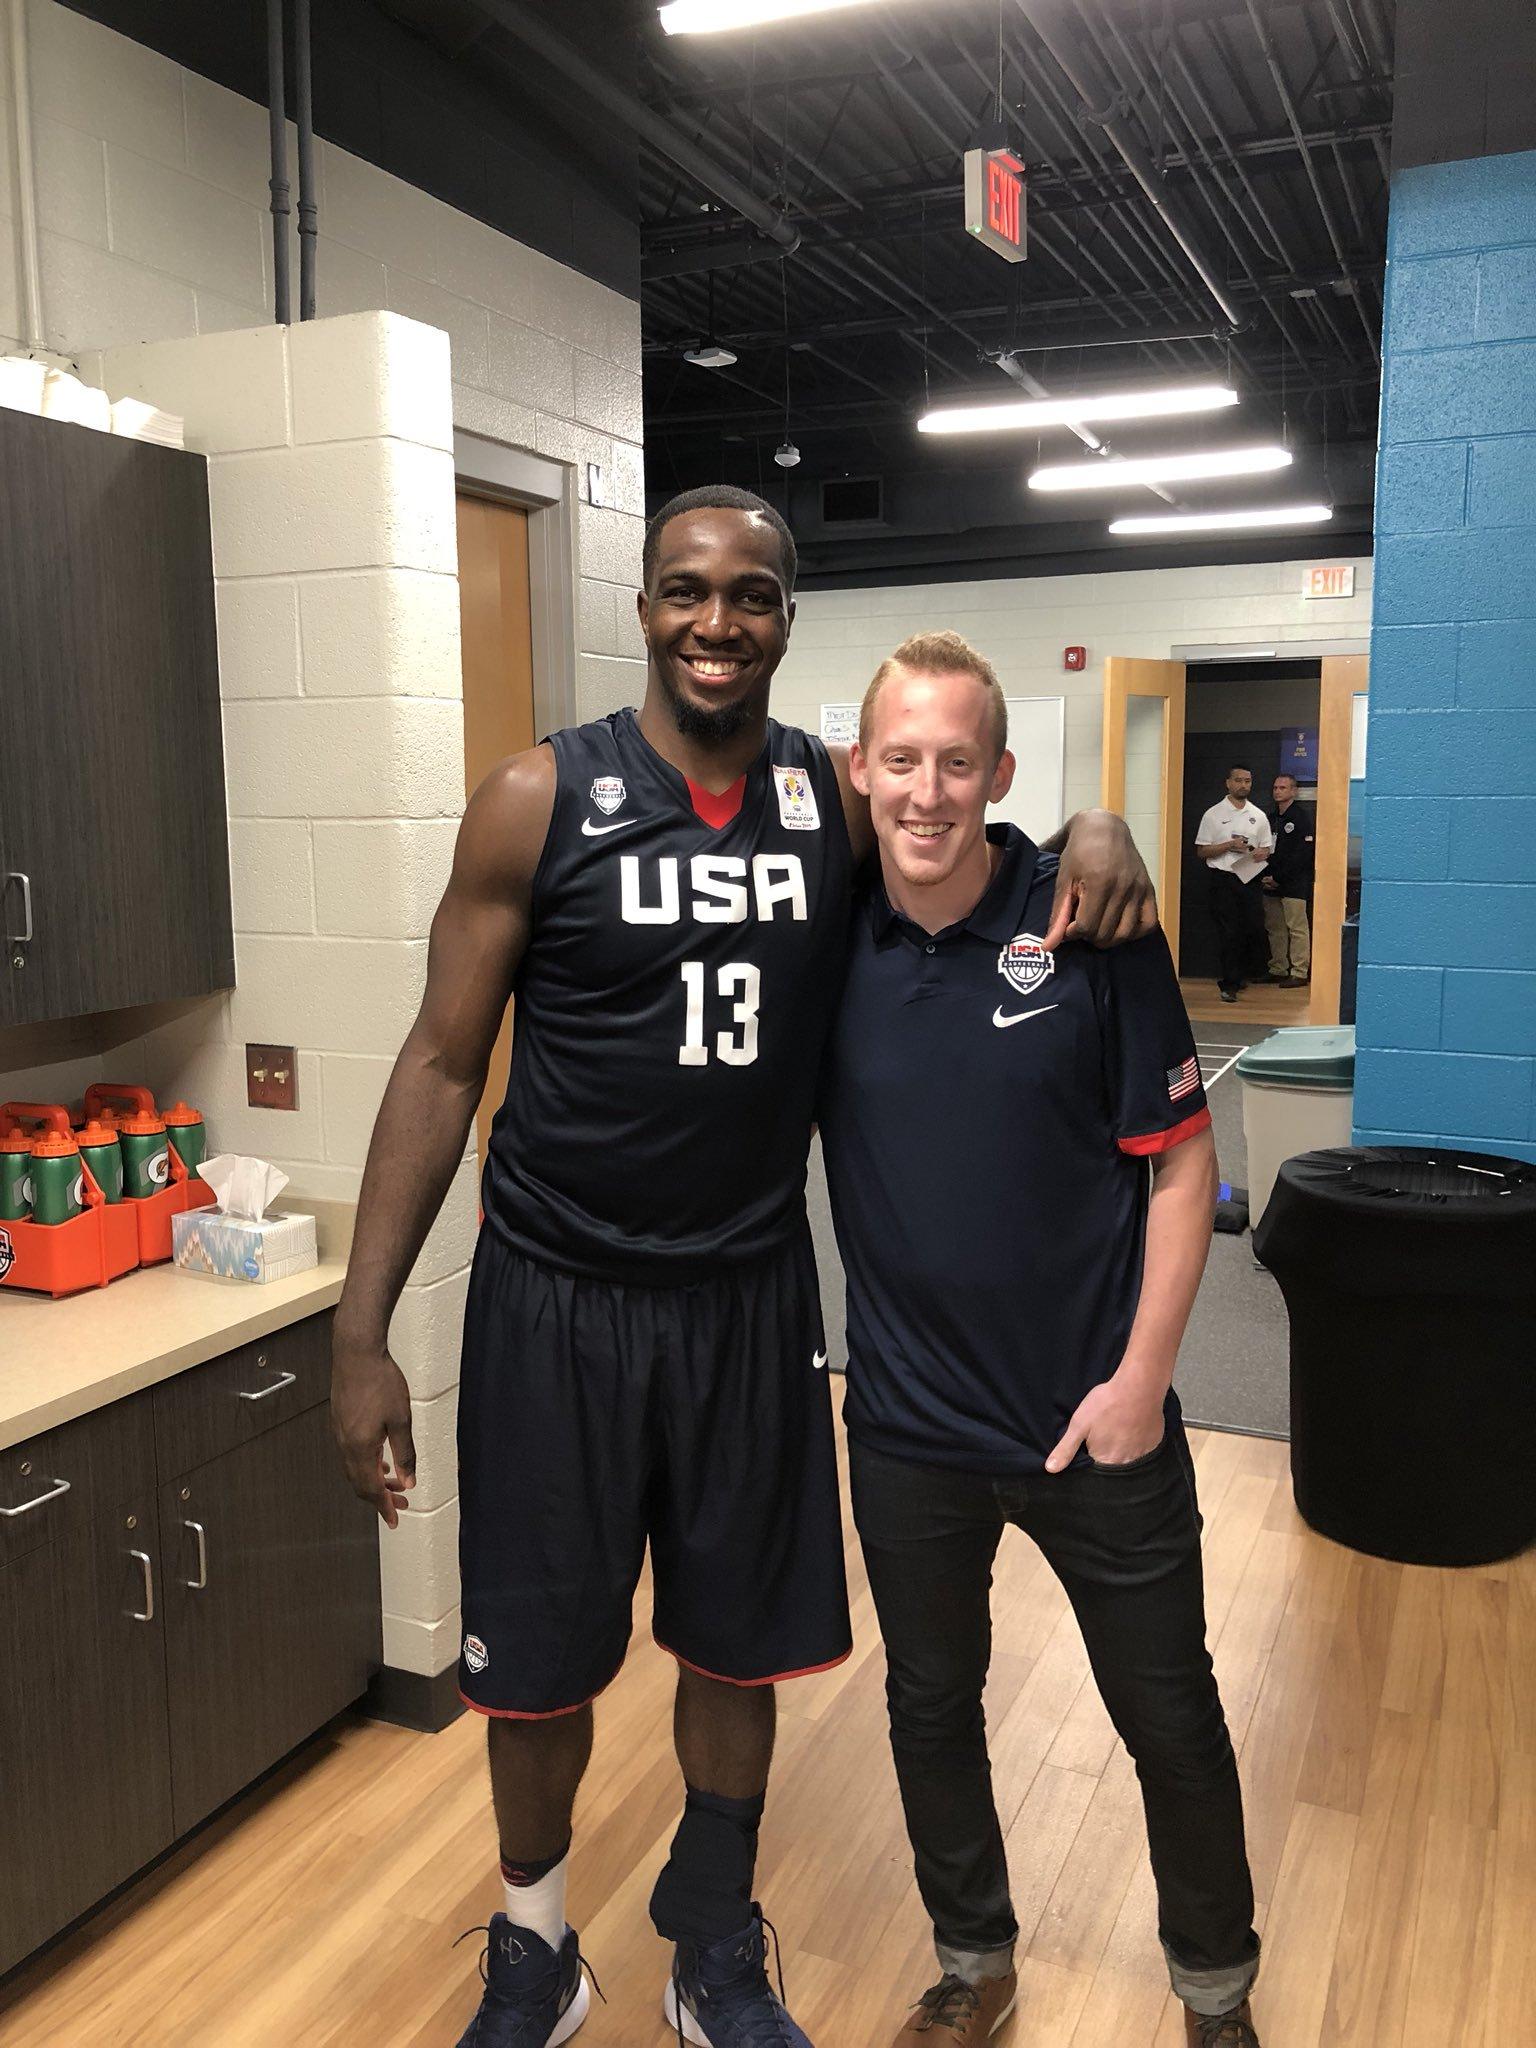 Team USA and Stony Brook Alum: Jameel Warney